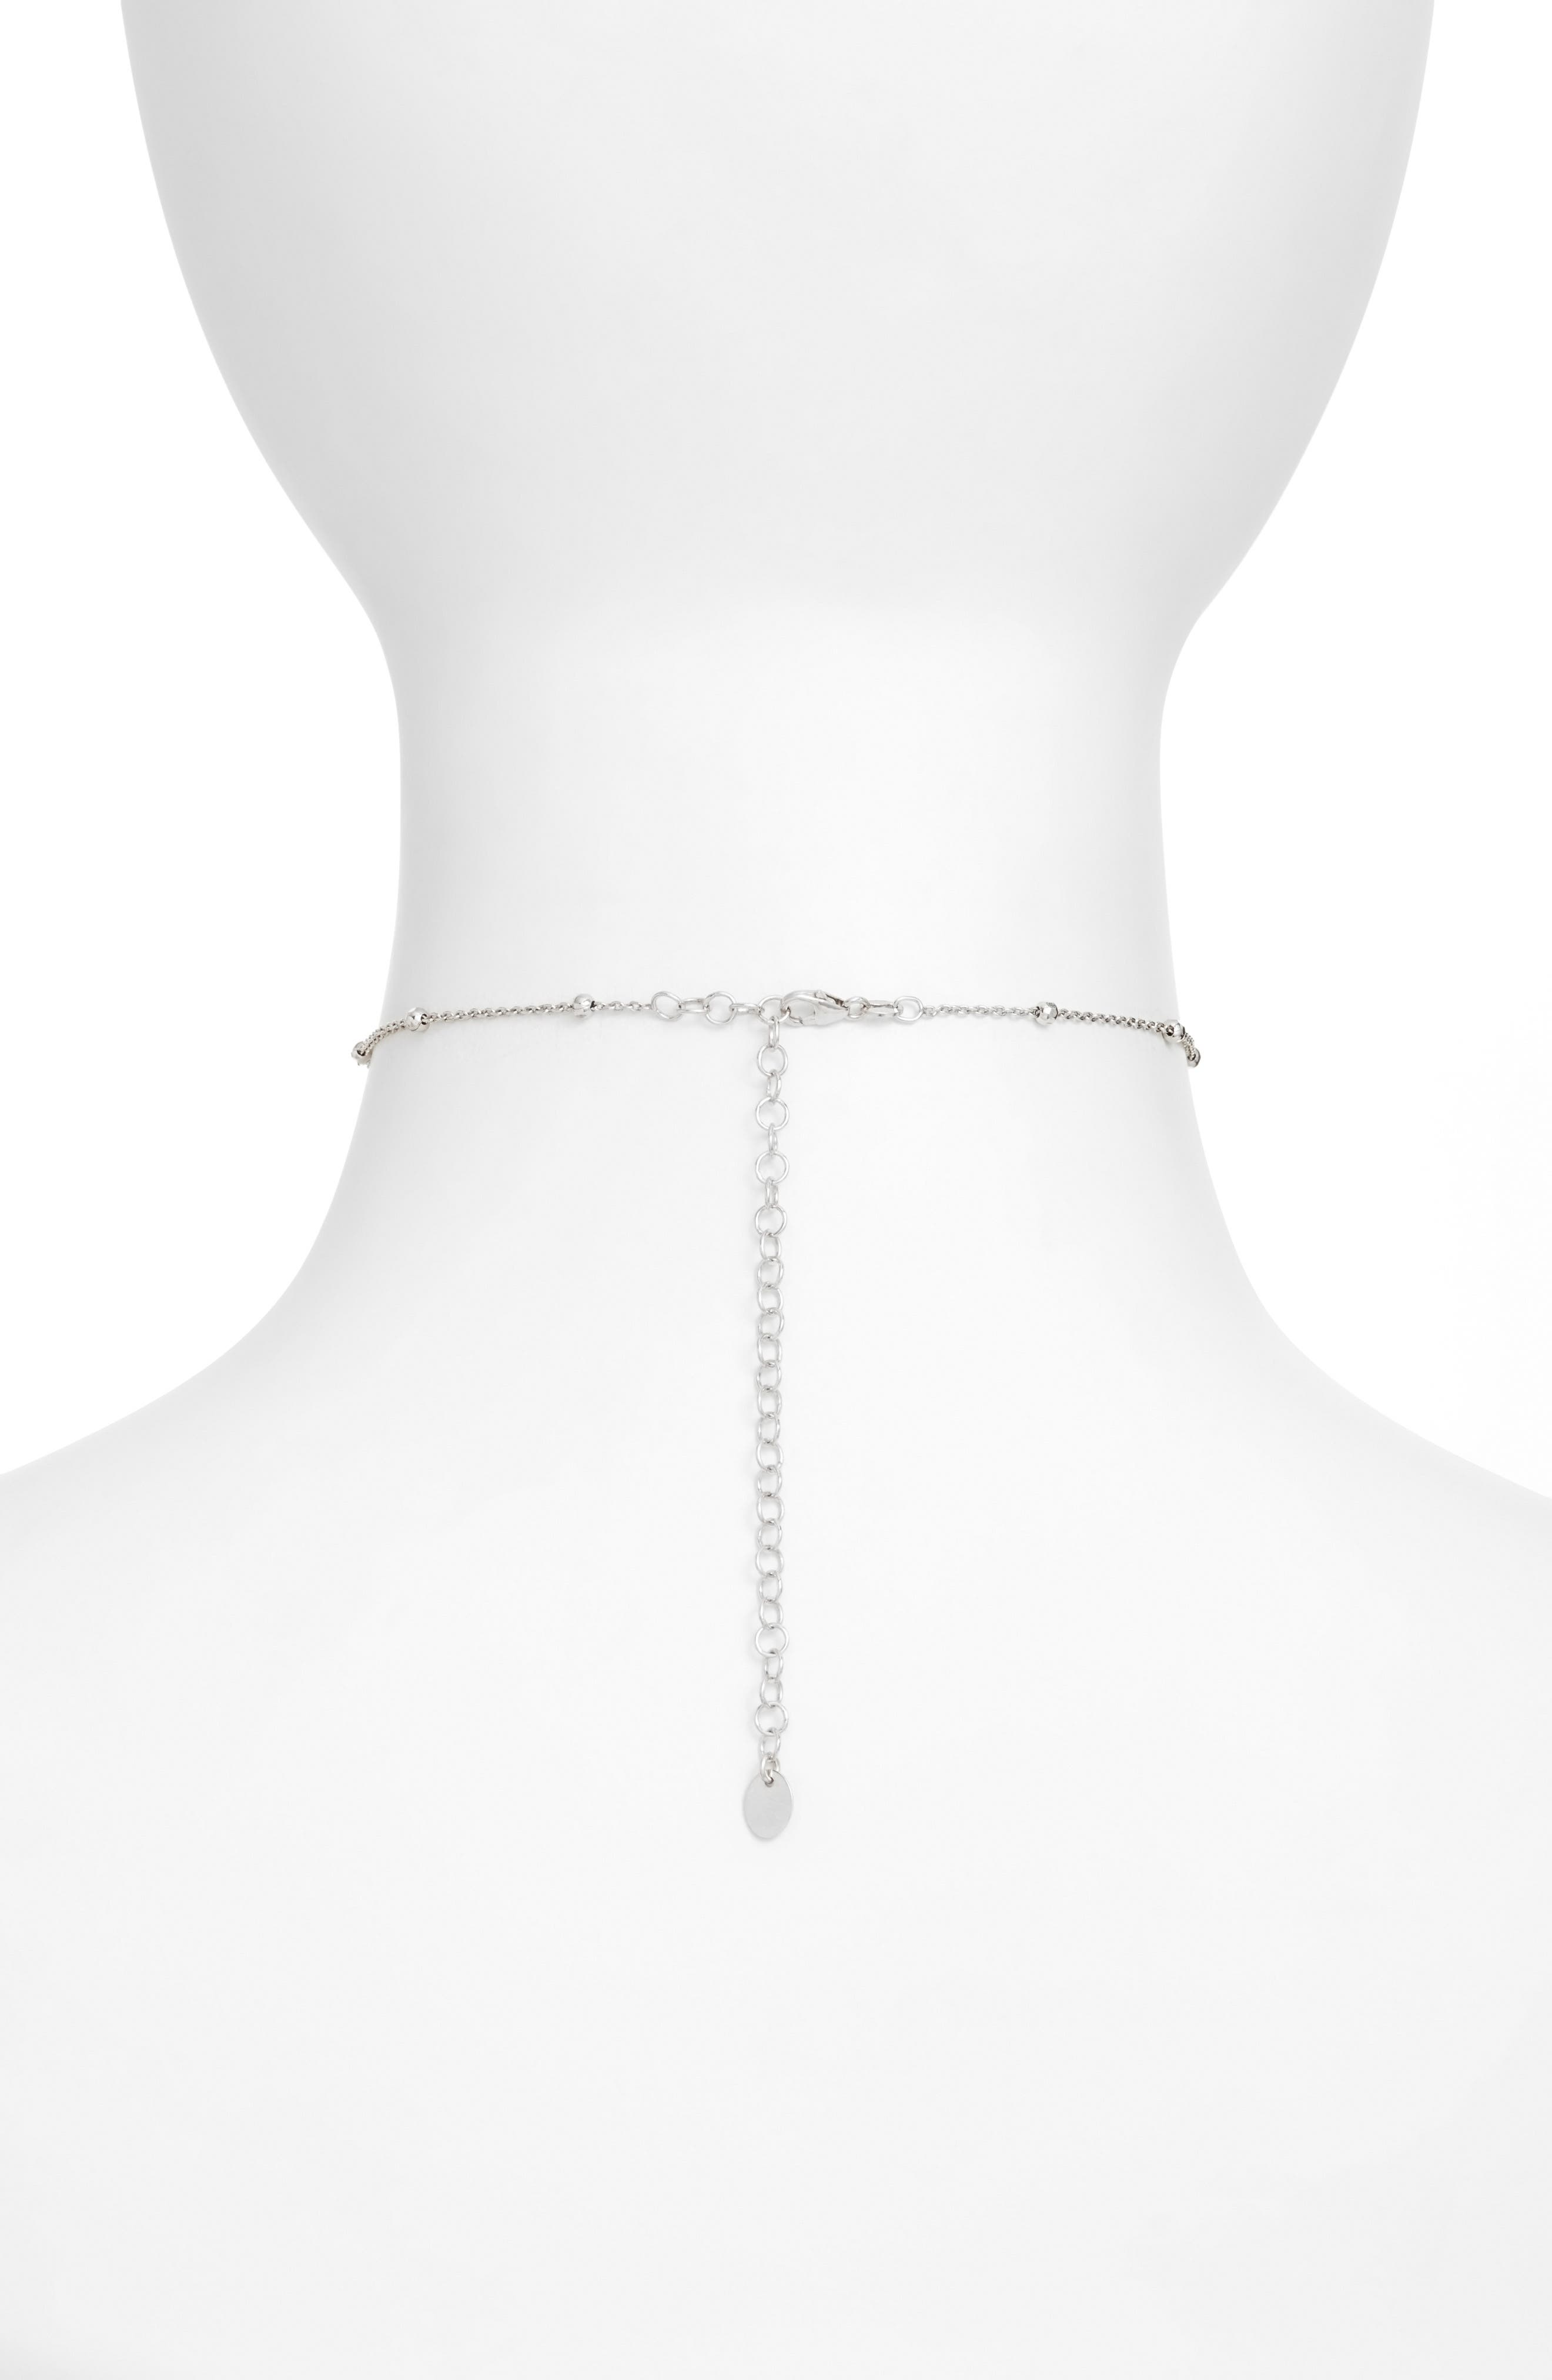 Choker Necklace,                             Alternate thumbnail 2, color,                             Silver